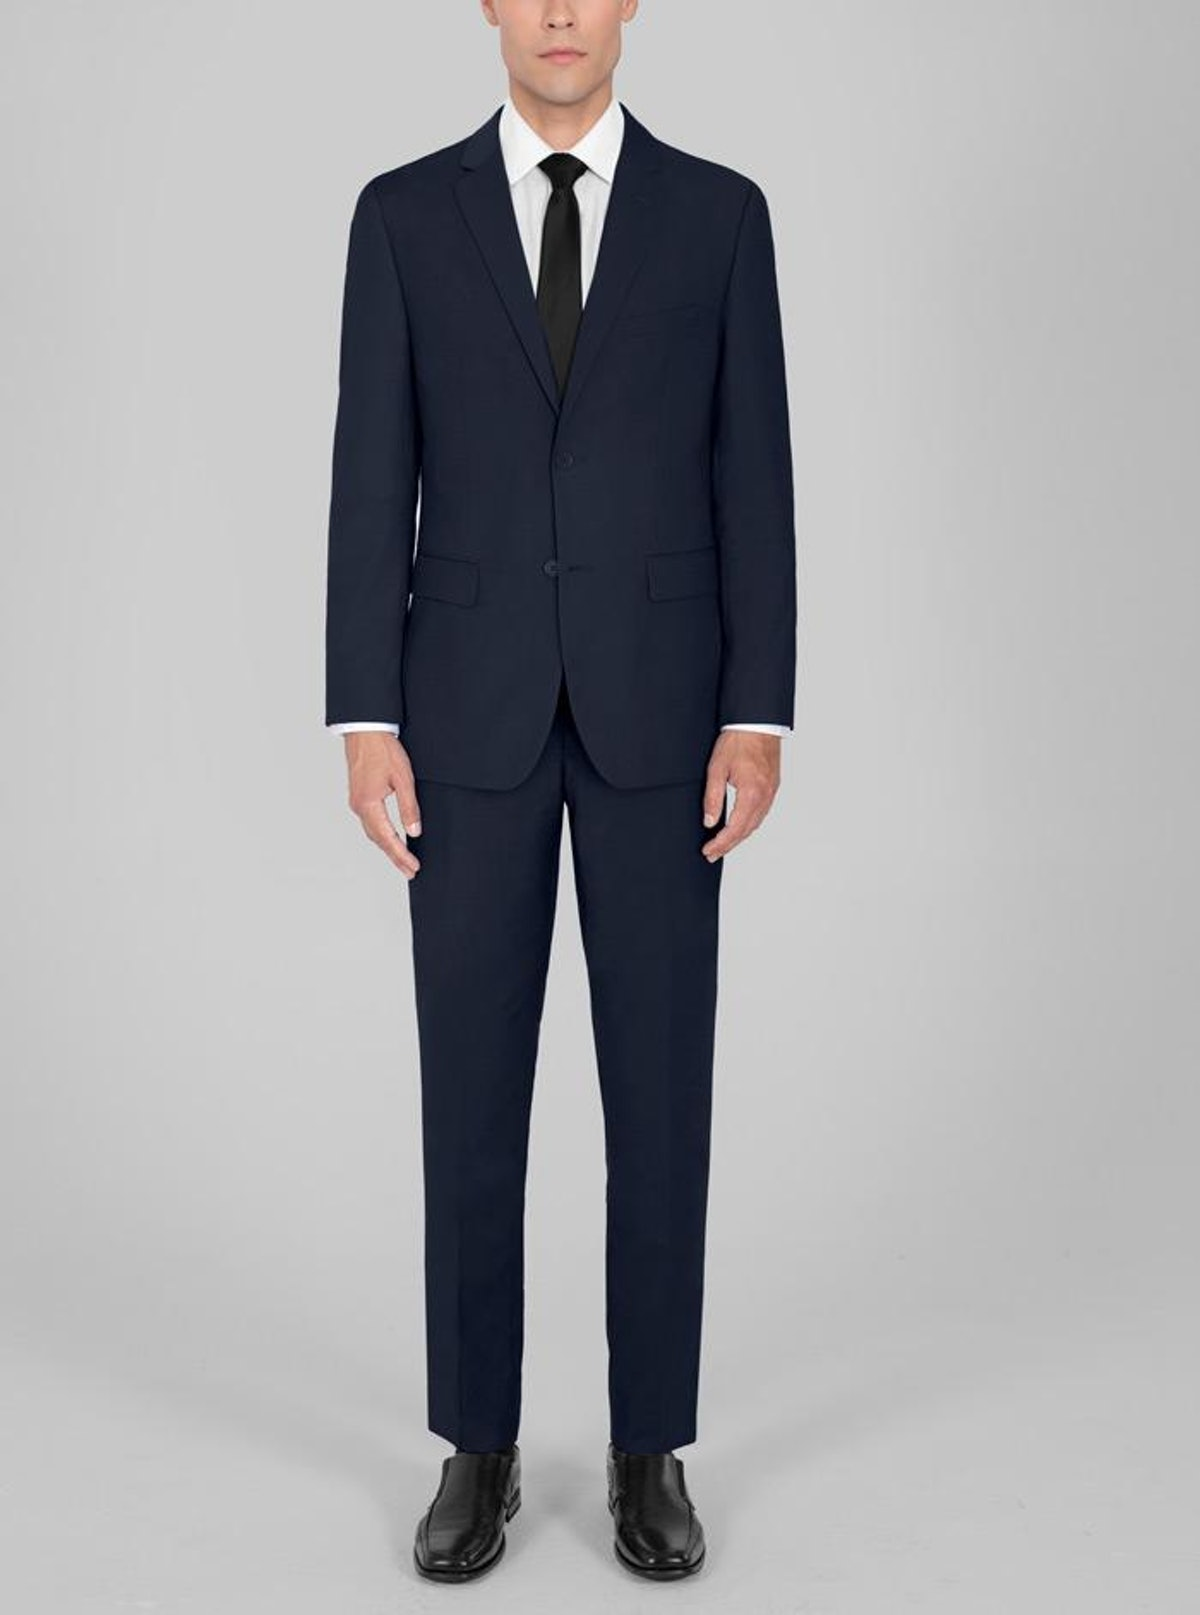 Johnny Rose from 'Schitt's Creek' always wears nice suits.